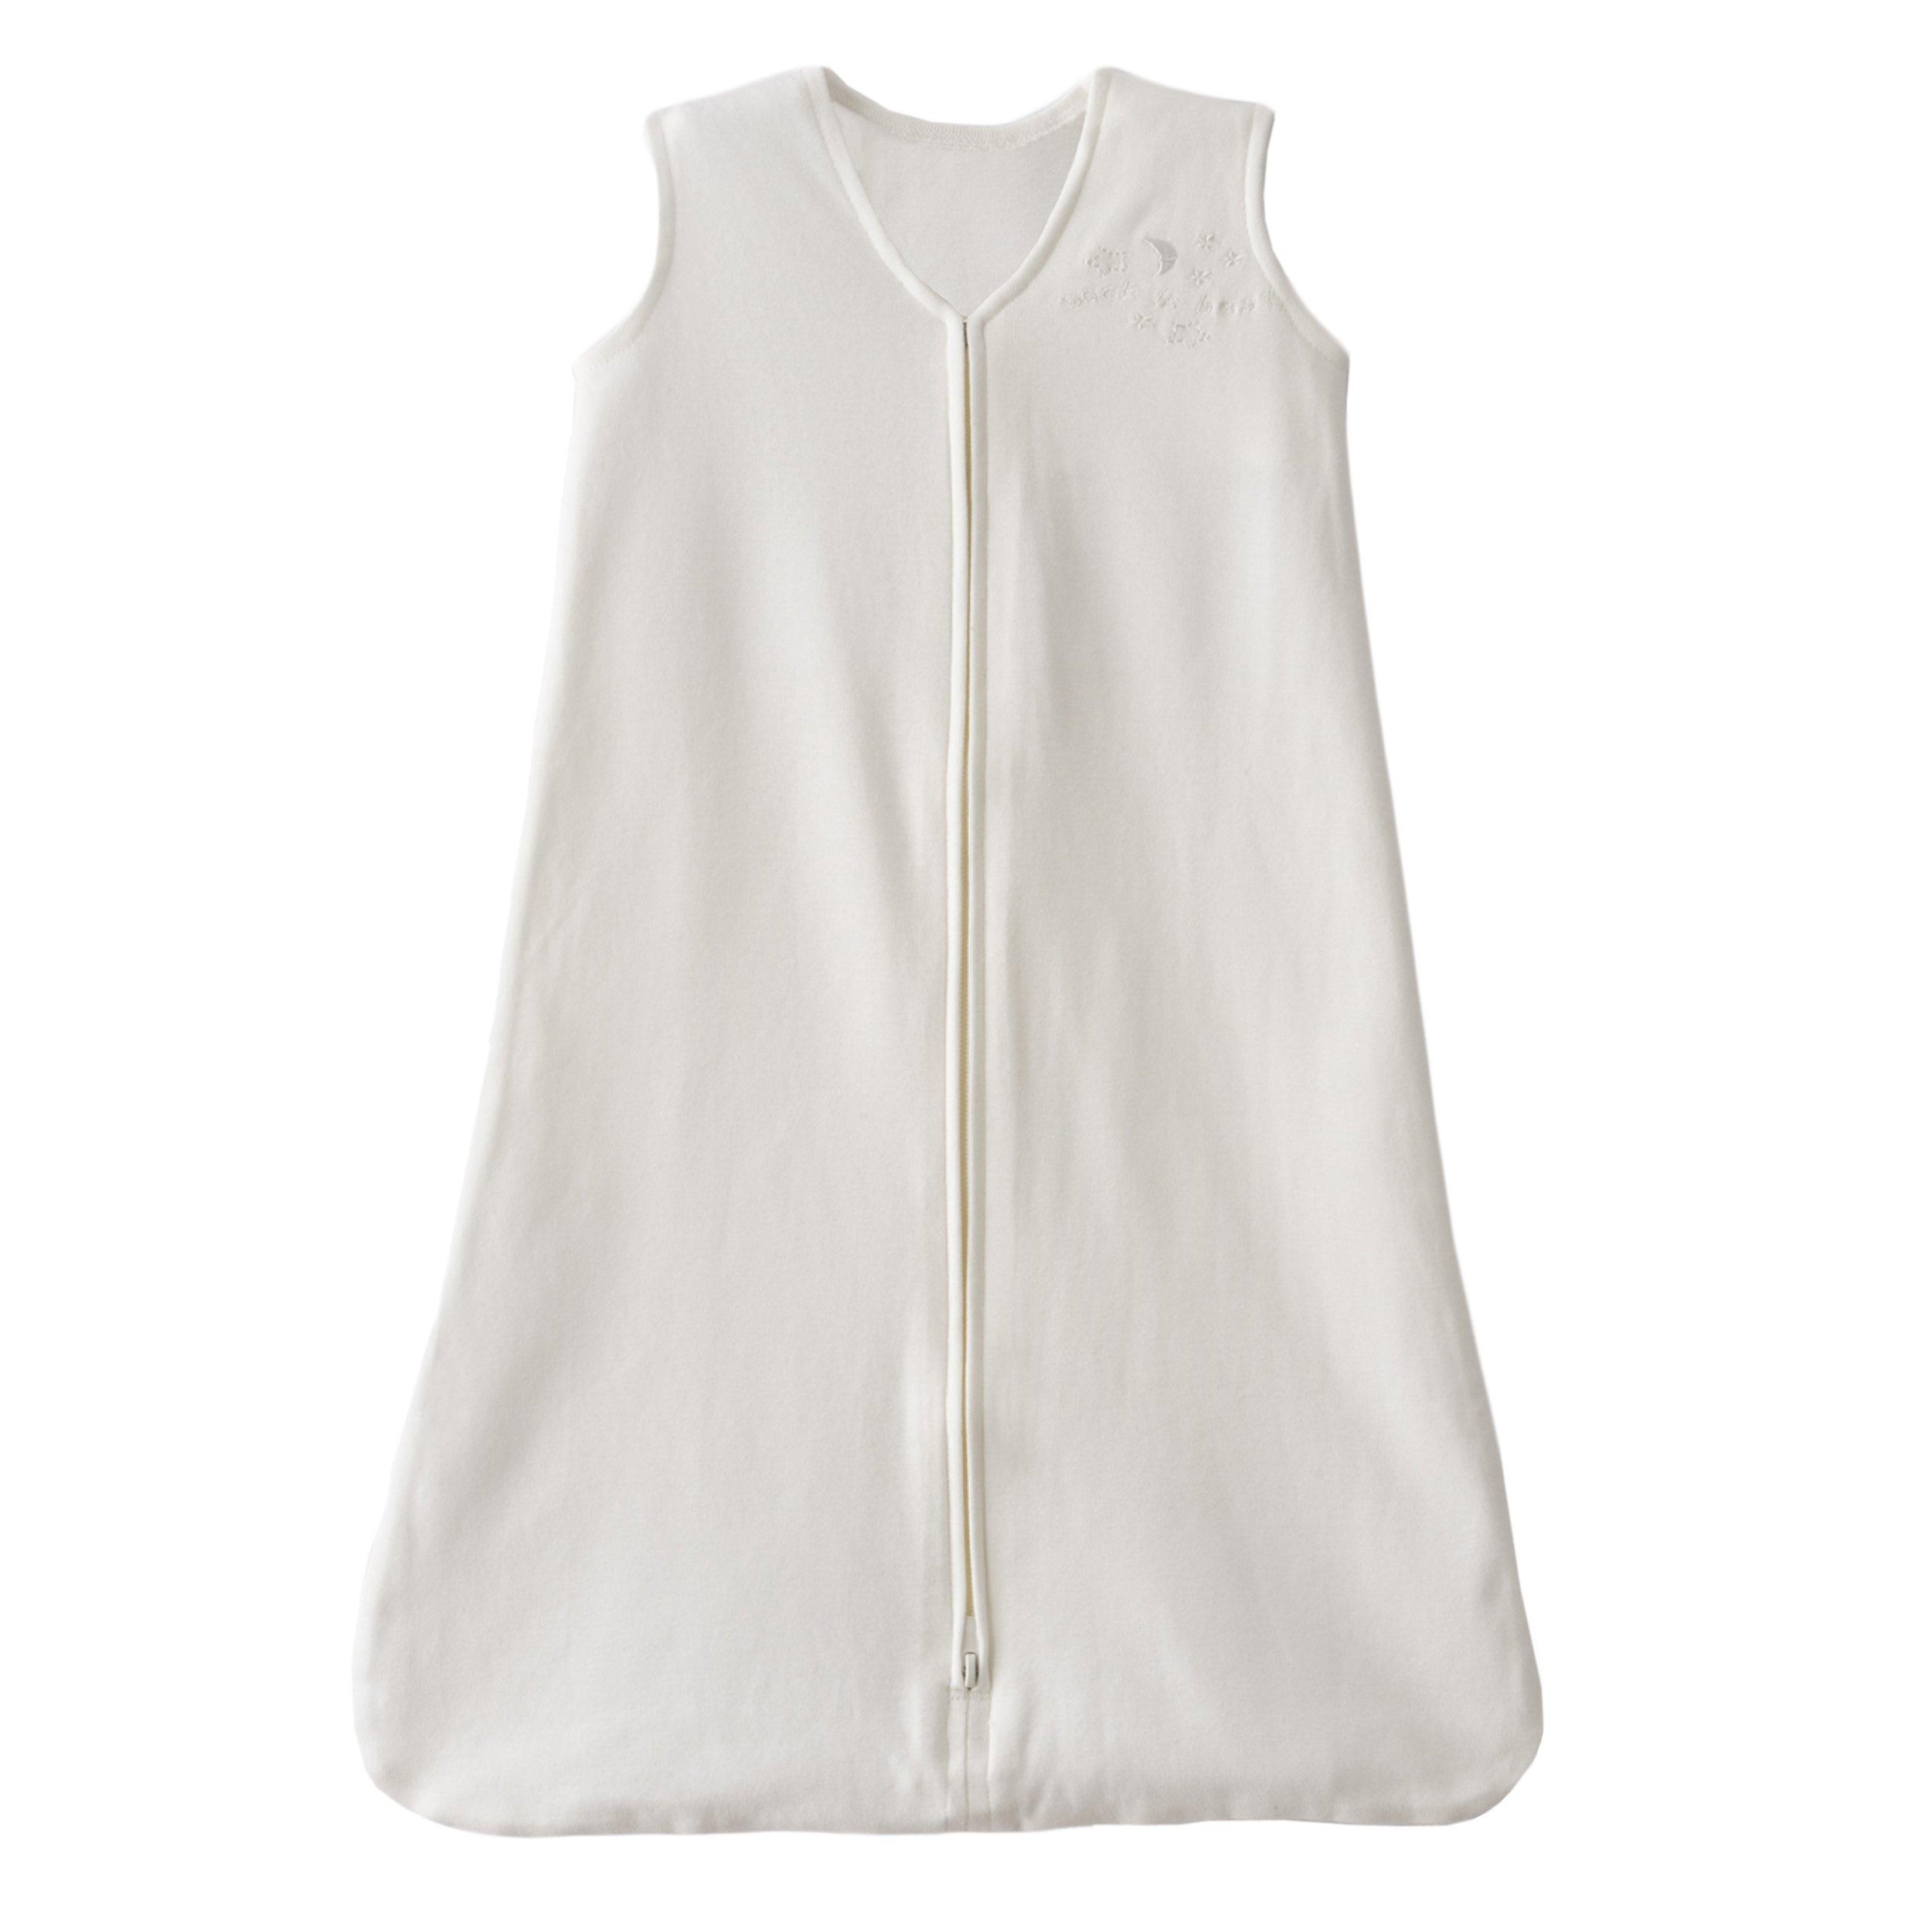 HALO Sleepsack 100% Organic Cotton Wearable Blanket, Natural, Medium